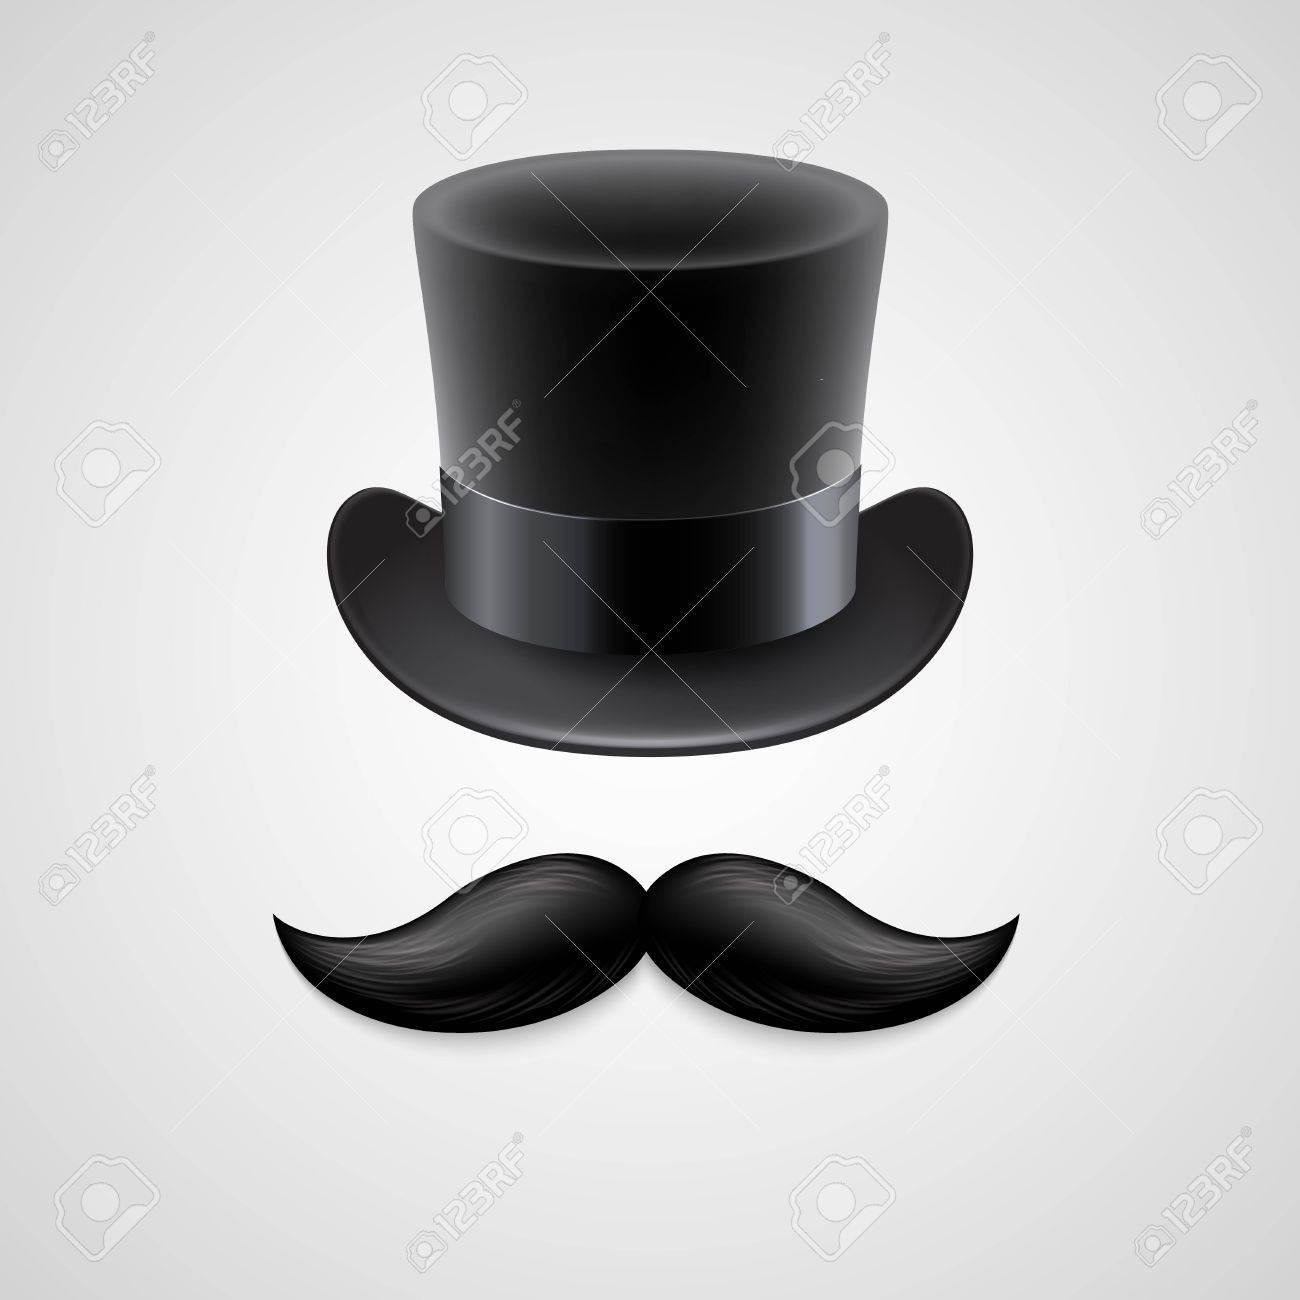 Foto de archivo - Sombrero de copa de la vendimia 9162021338b4